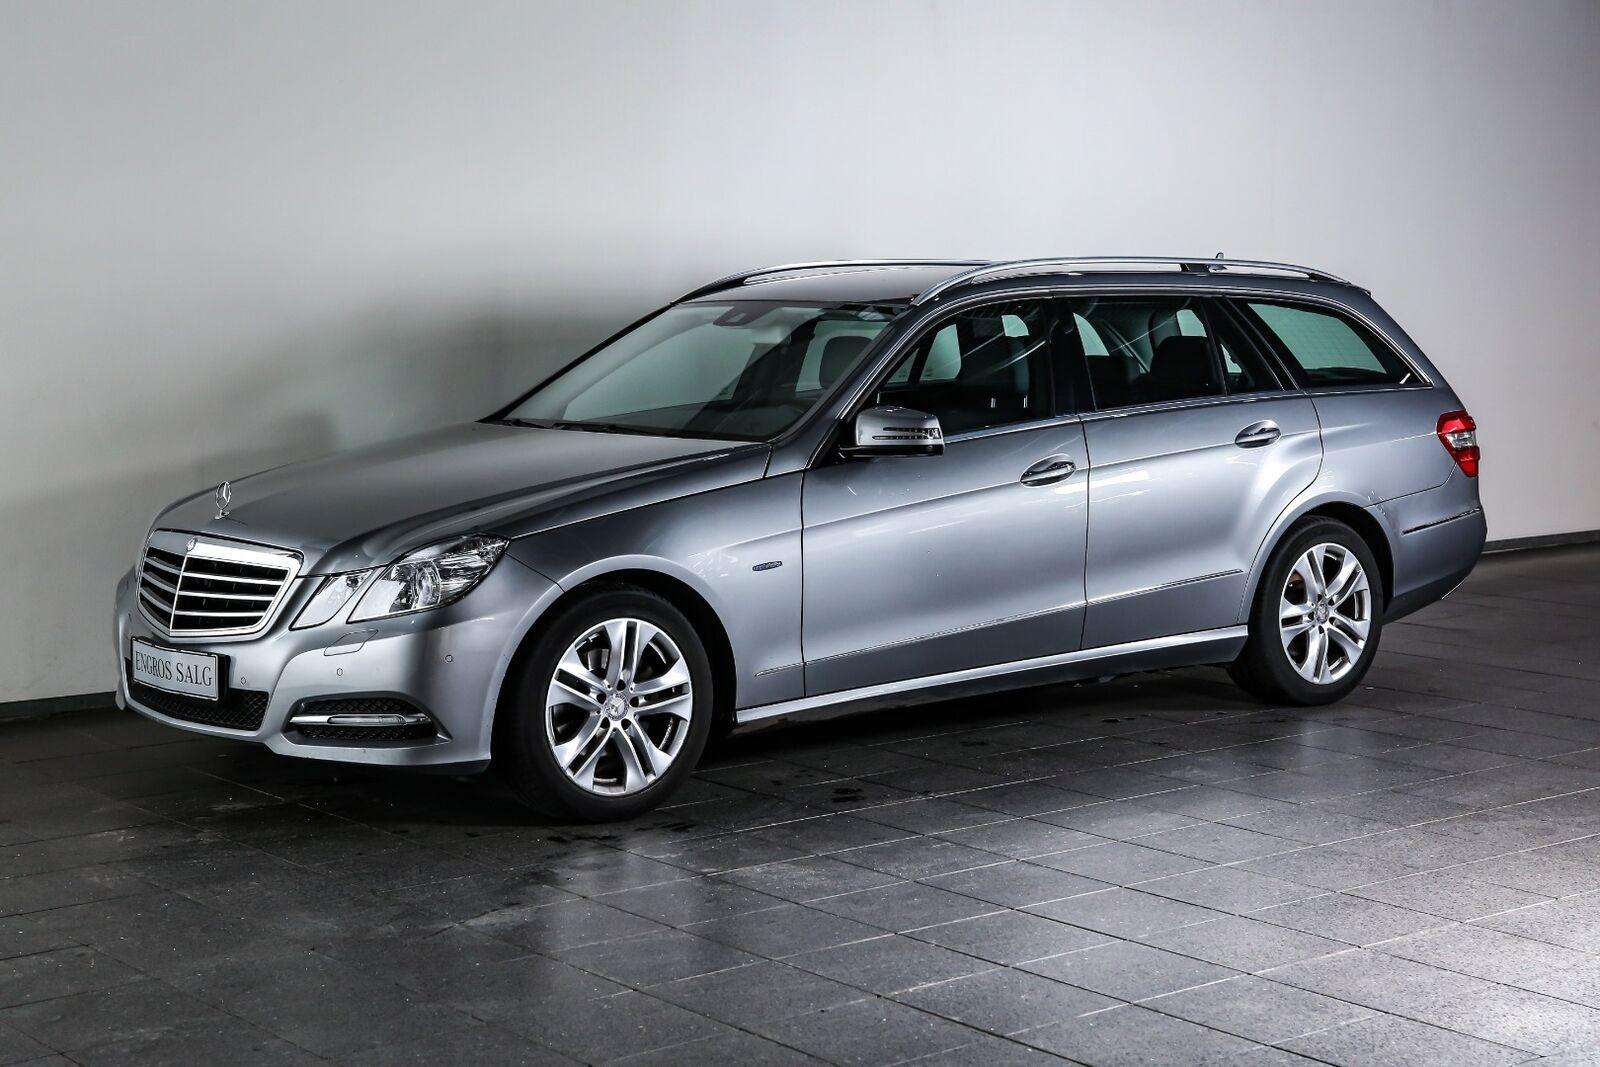 Mercedes-Benz E220 2,2 CDi Avantgarde stc. aut. BE